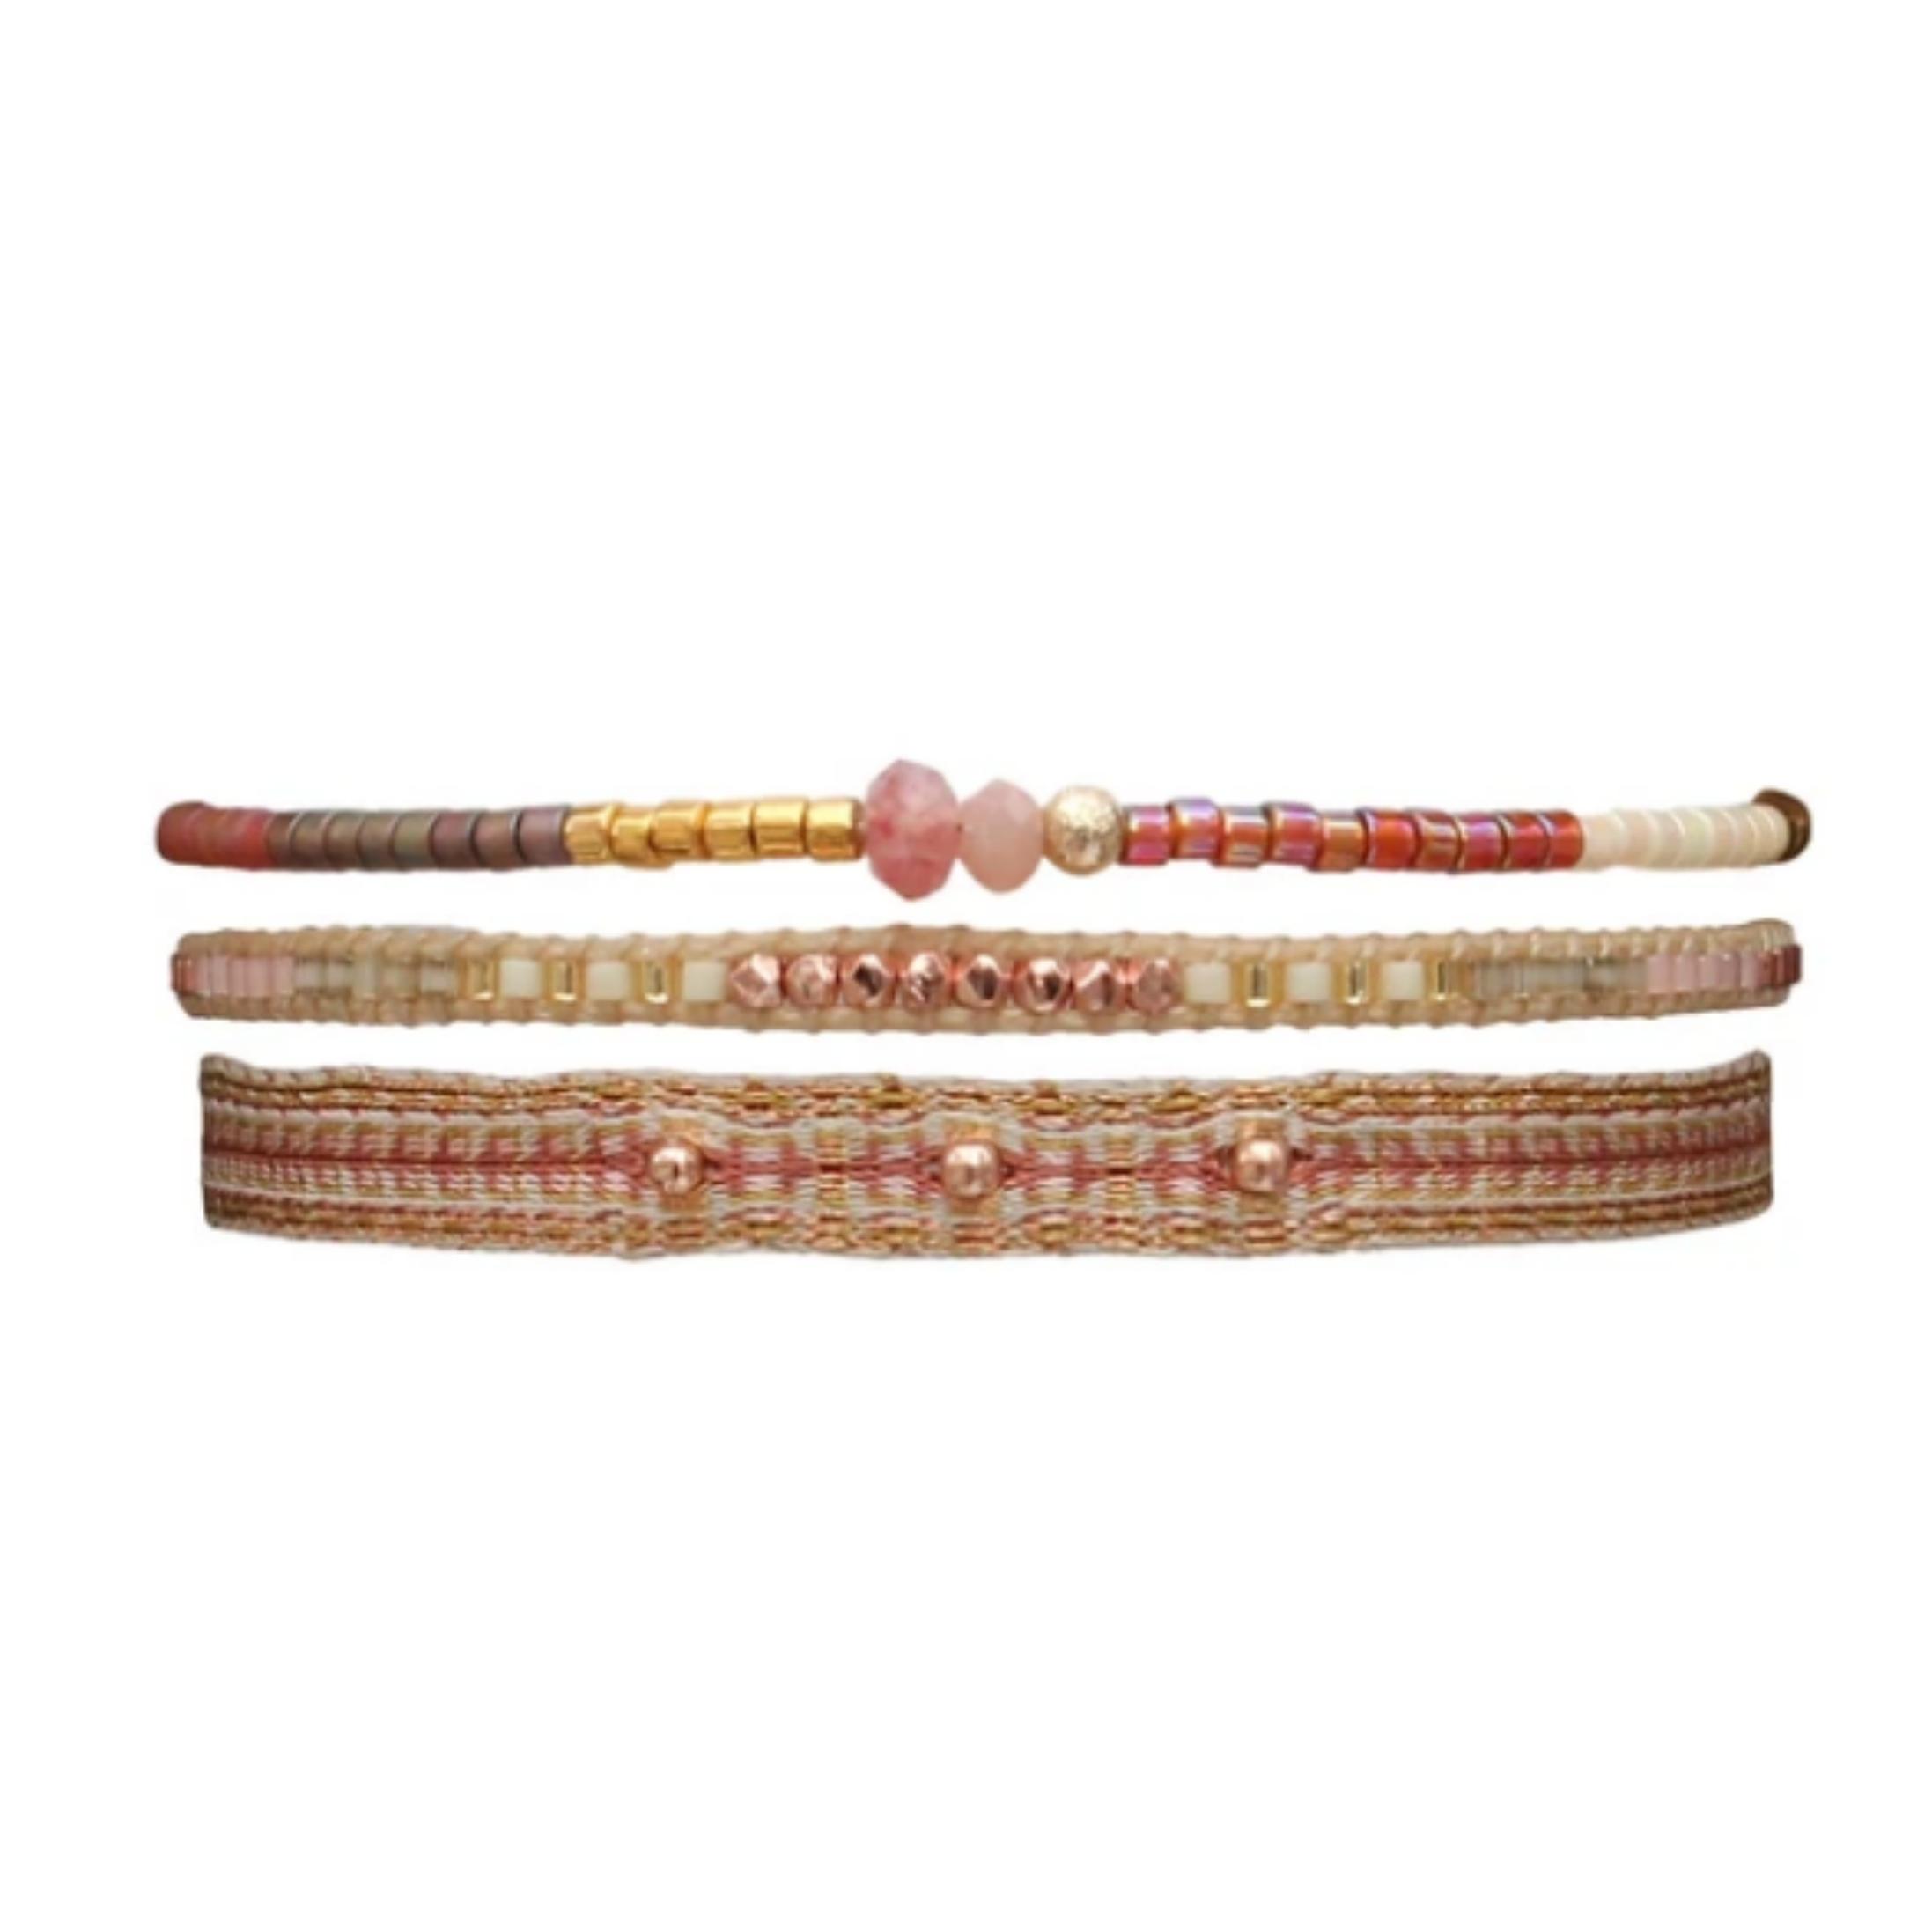 LeJu London - Set Bracelets LJA0052